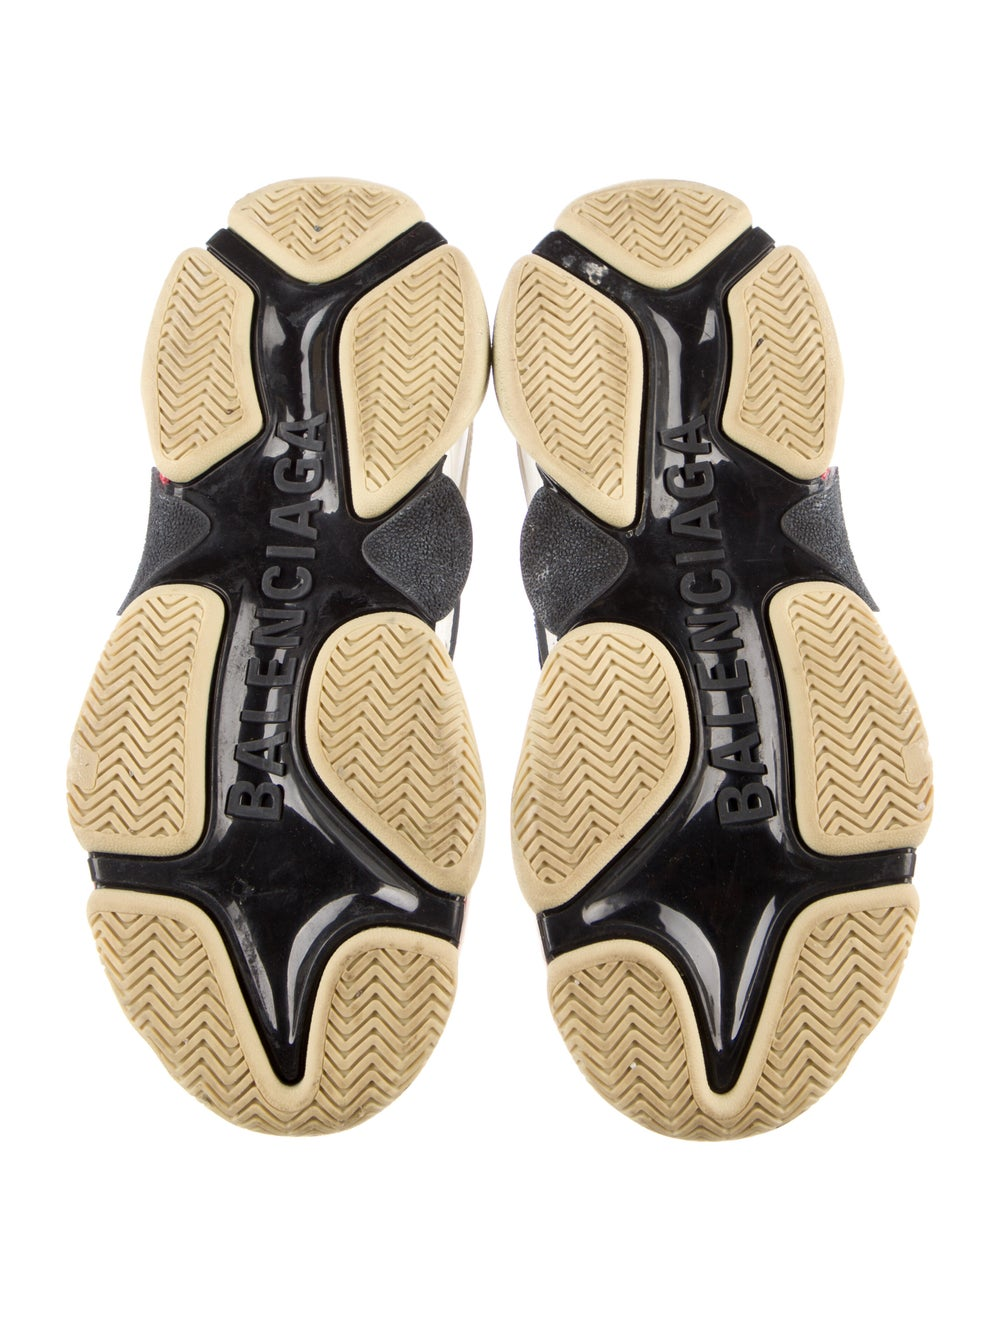 Balenciaga Triple S Sneakers Chunky Sneakers Black - image 5